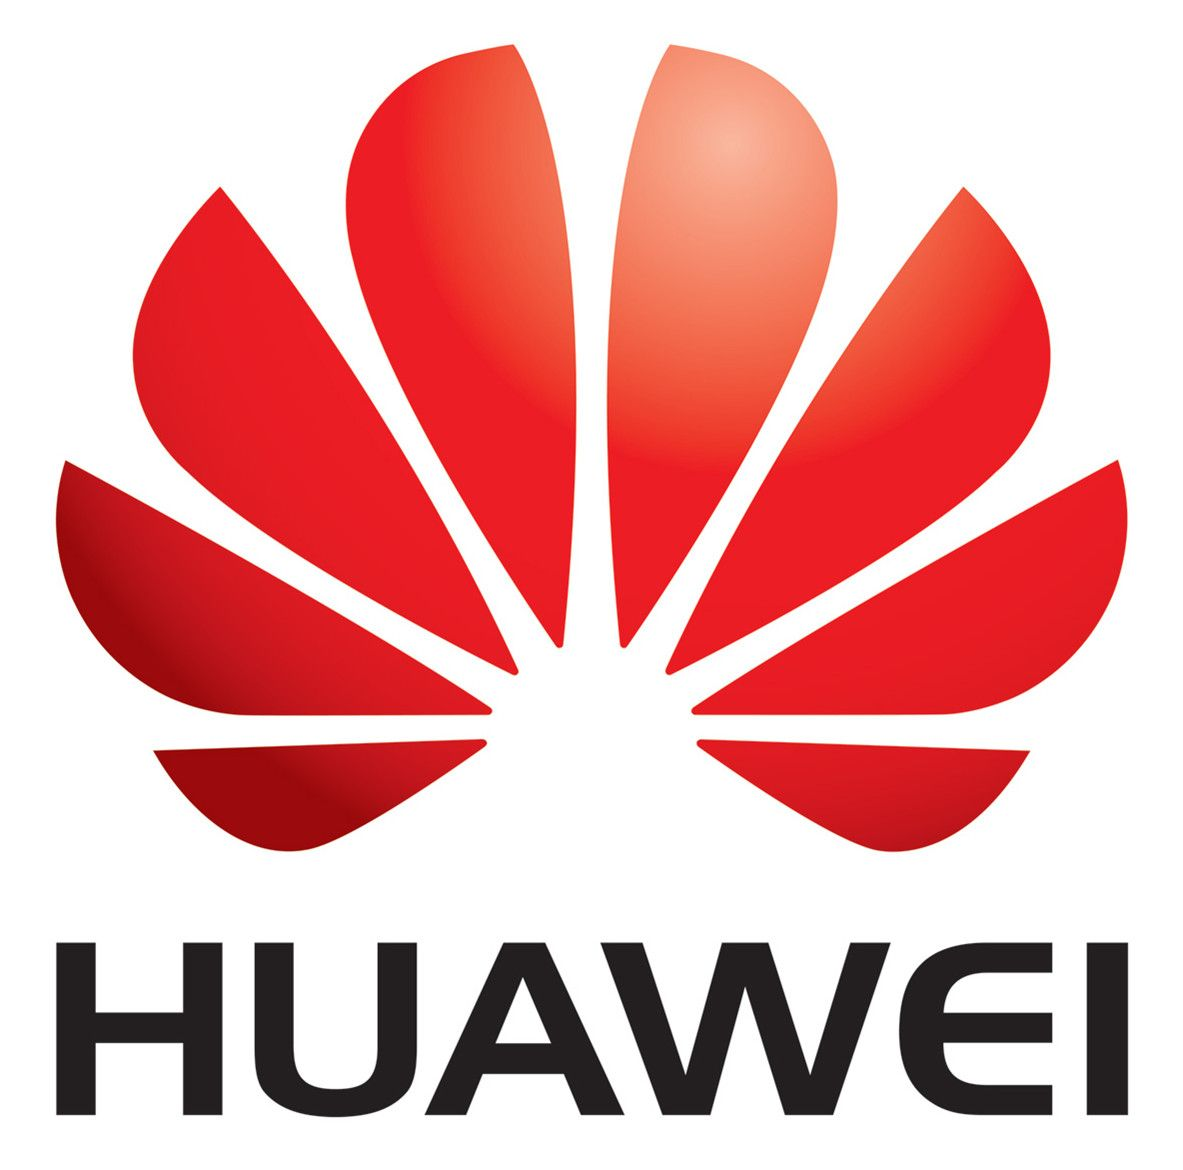 Huawei logo wallpaper huawei pesquisa e desenvolvimento